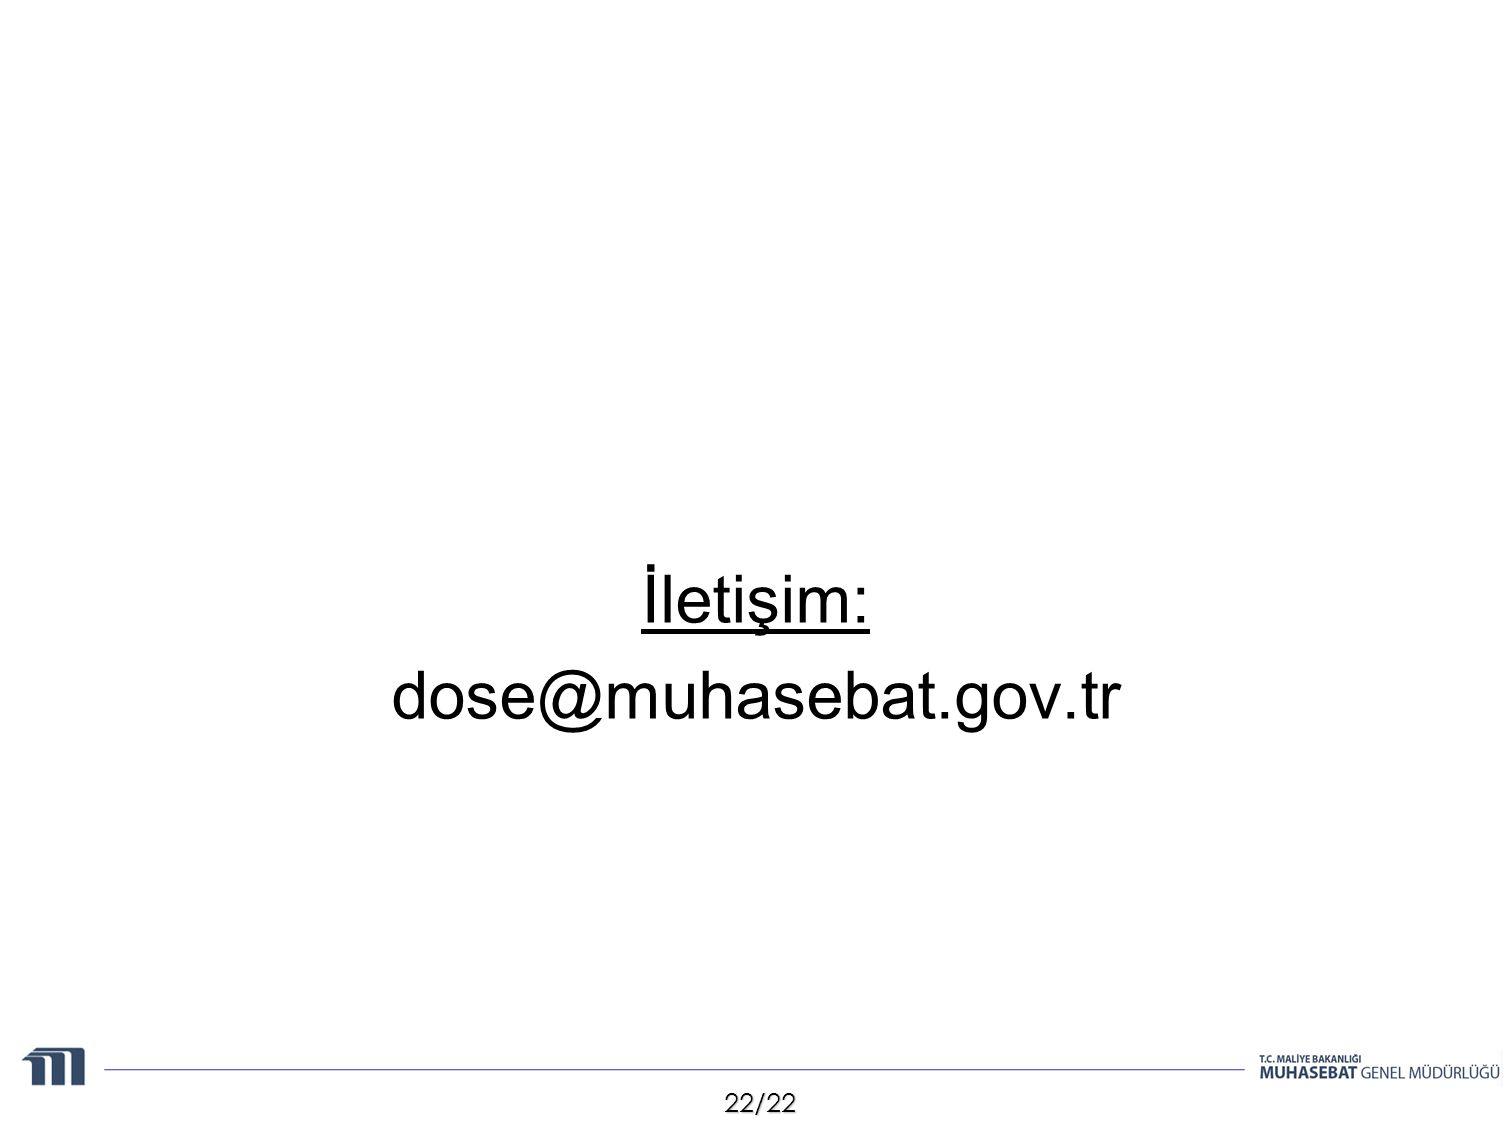 İletişim: dose@muhasebat.gov.tr